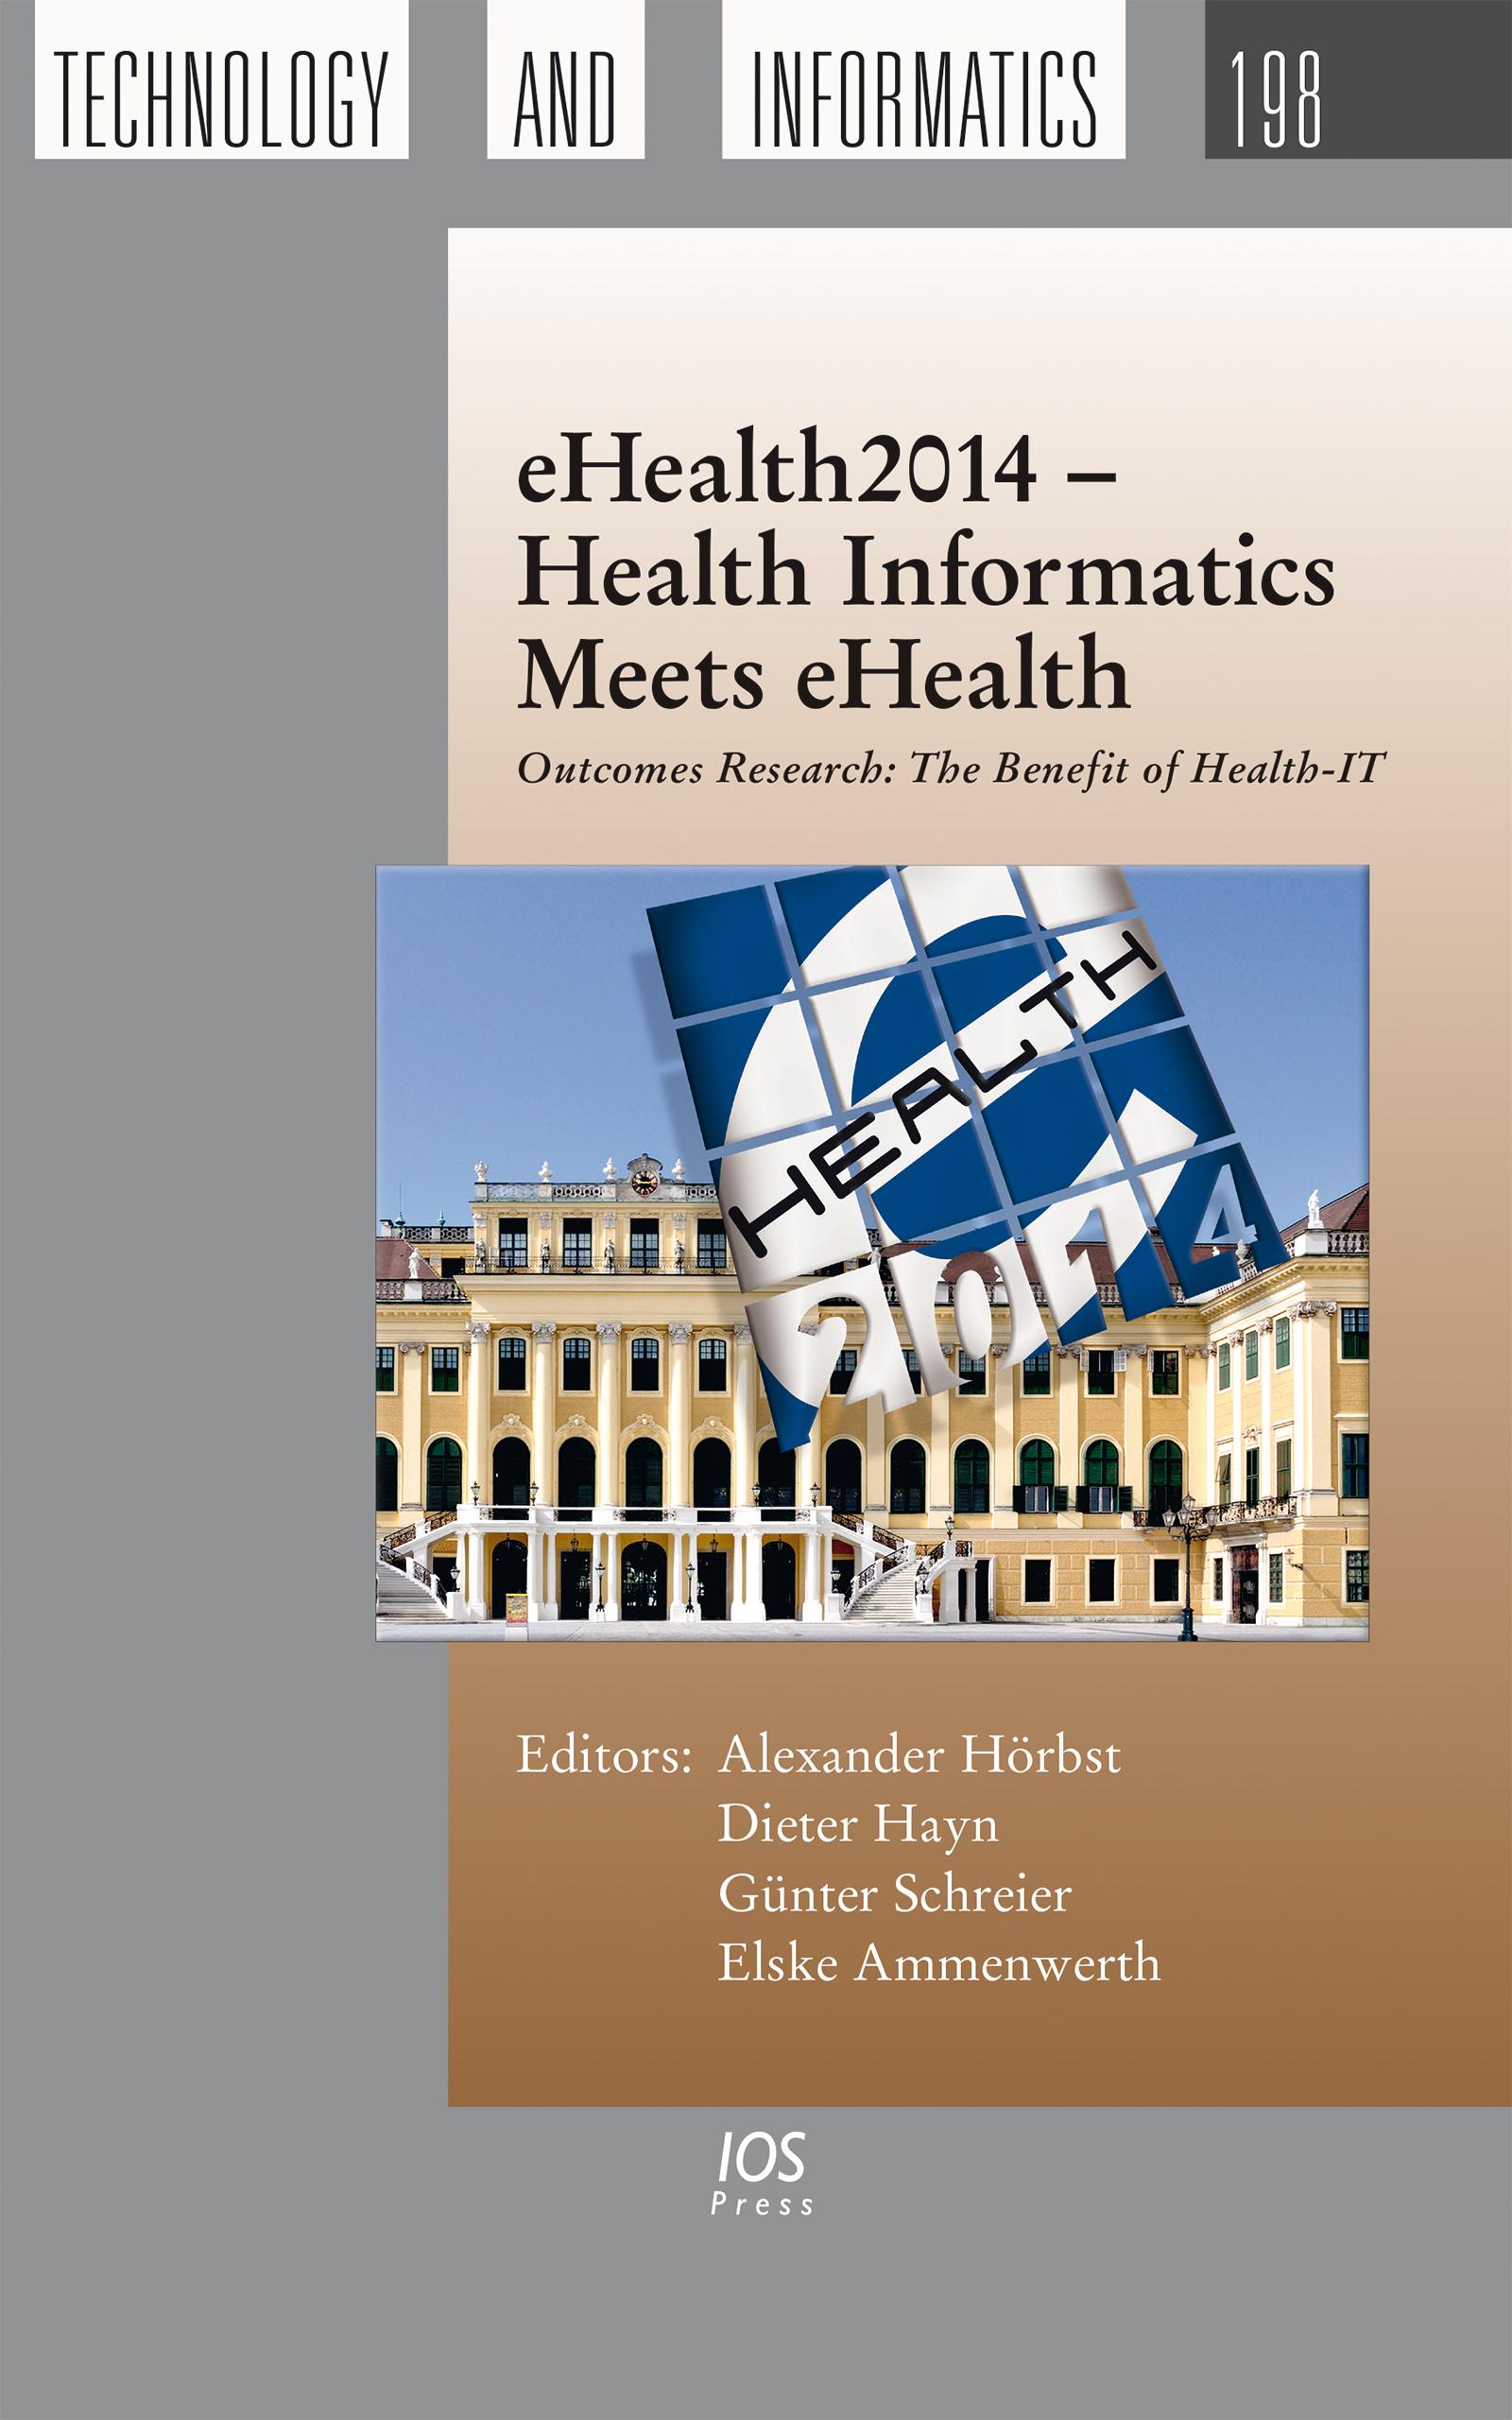 eHealth2014 – Health Informatics Meets eHealth